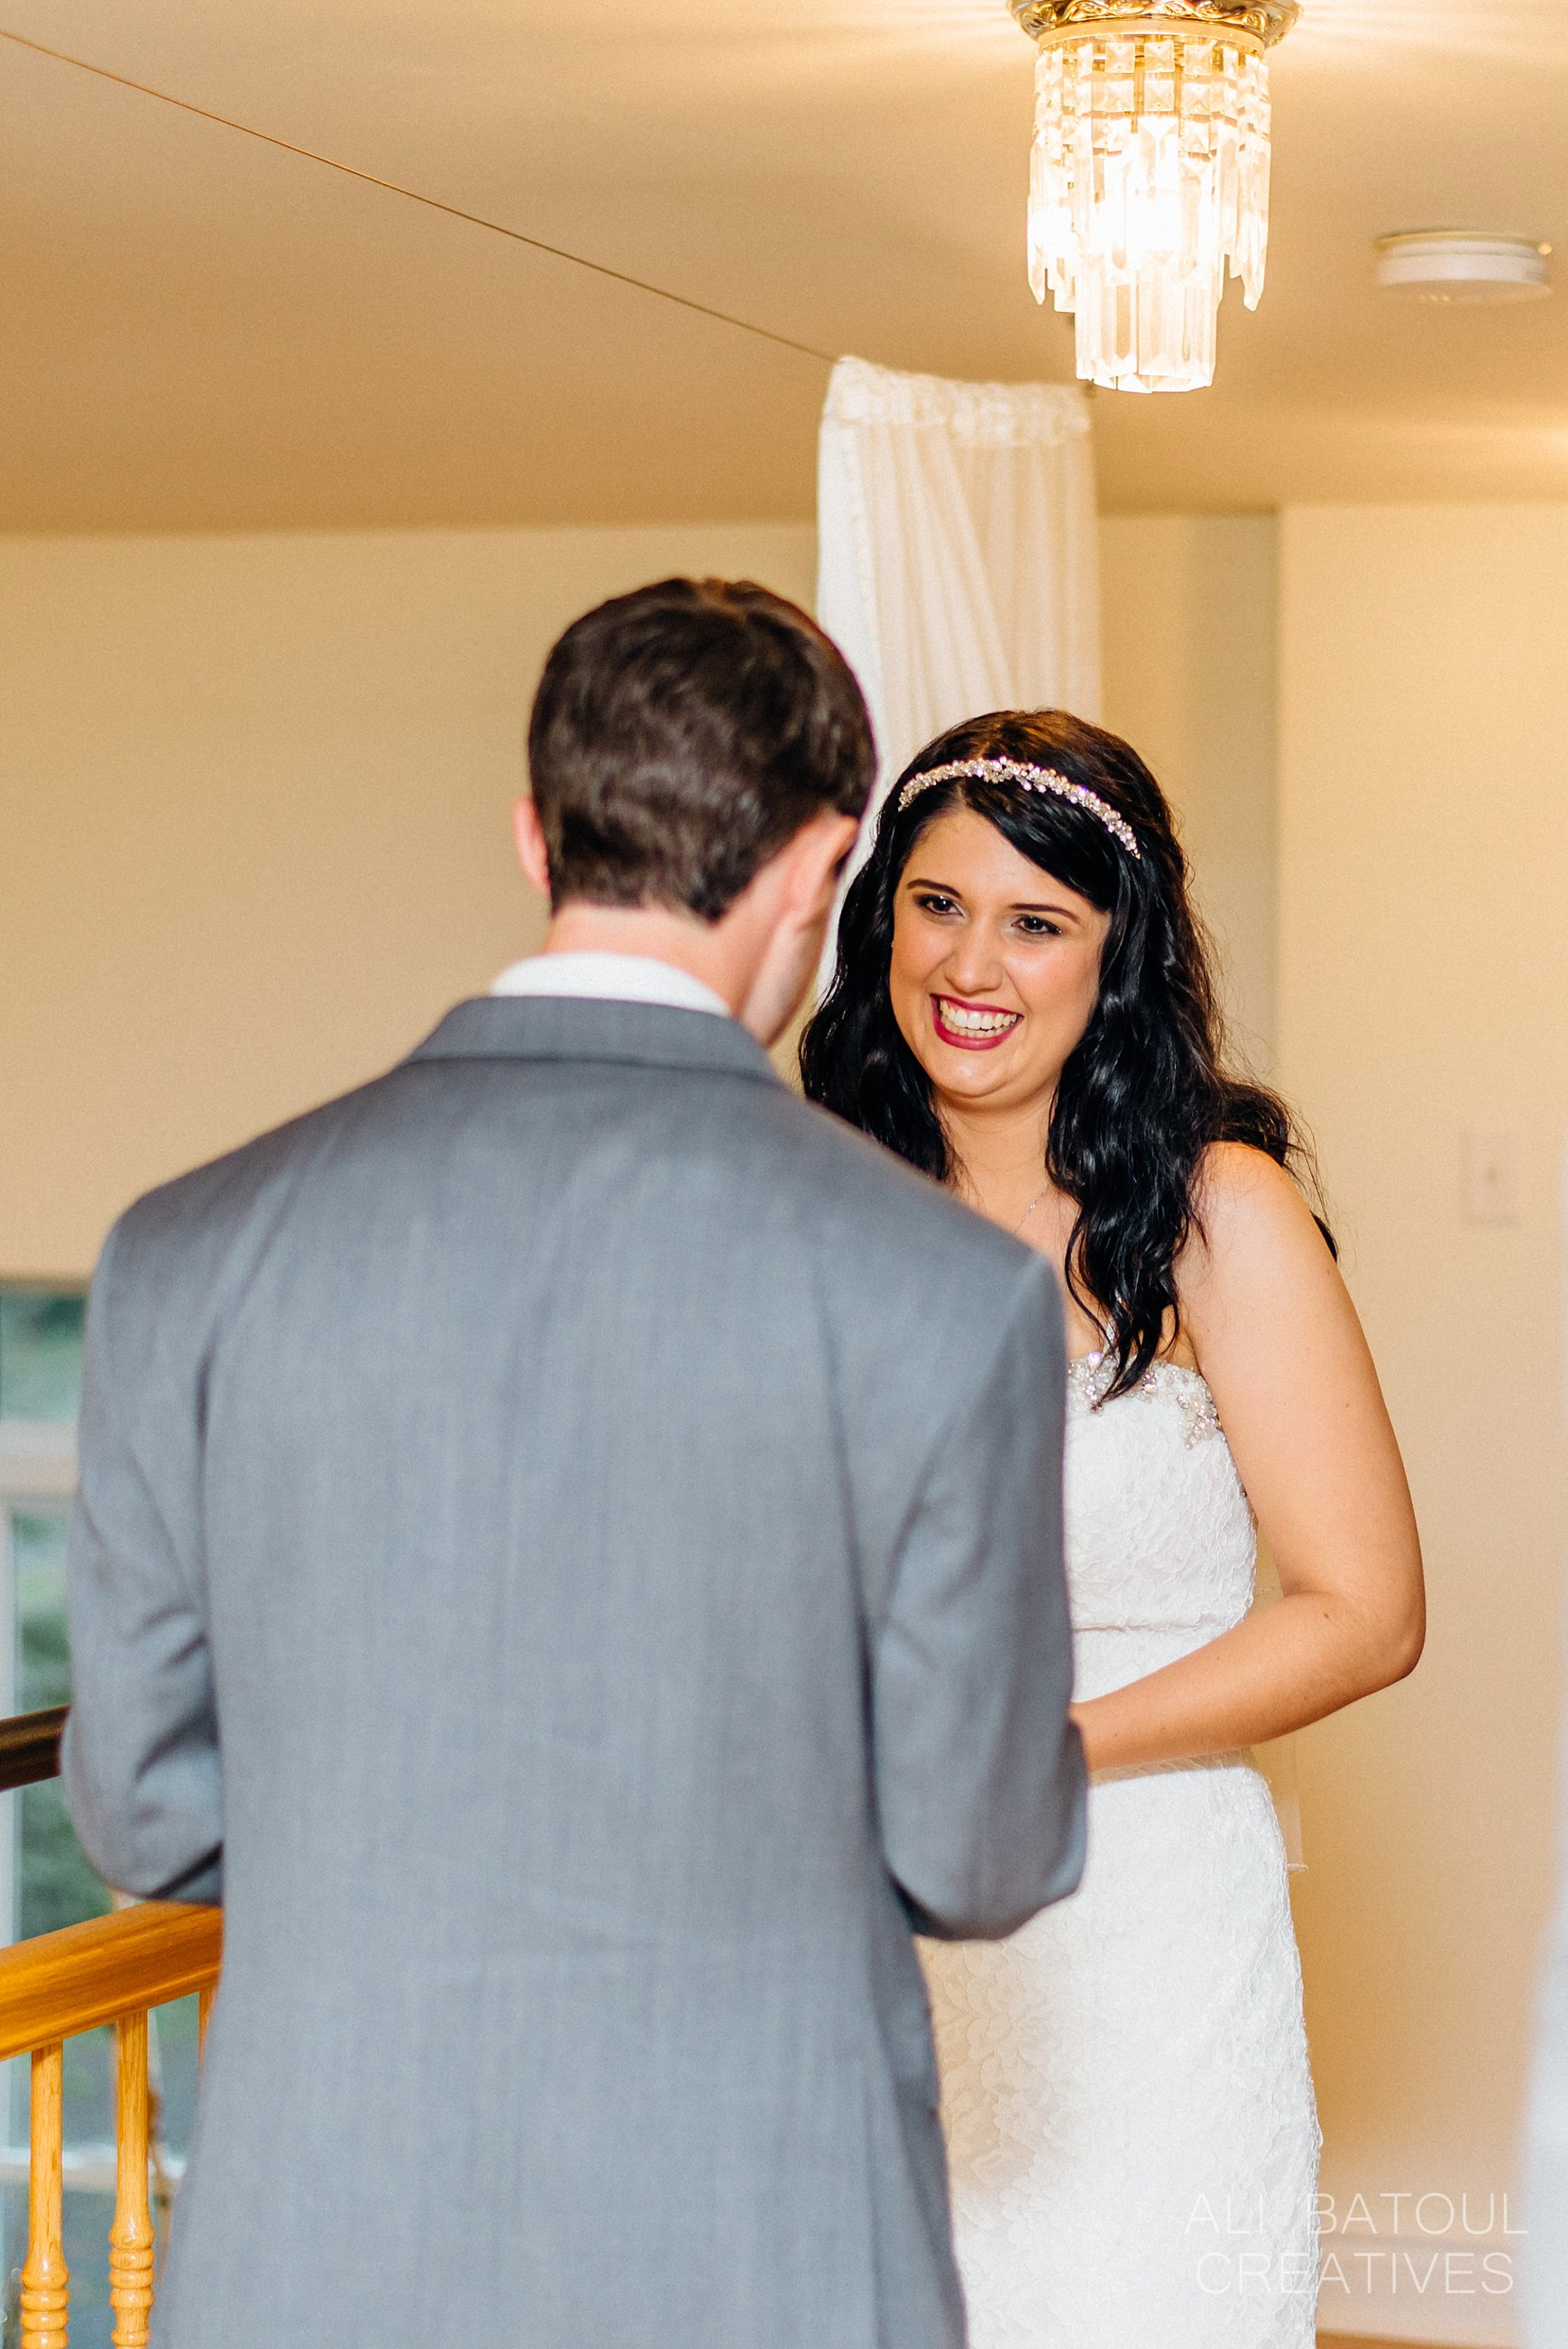 Jocelyn + Steve At The Schoolhouse Wedding - Ali and Batoul Fine Art Wedding Photography_0065.jpg